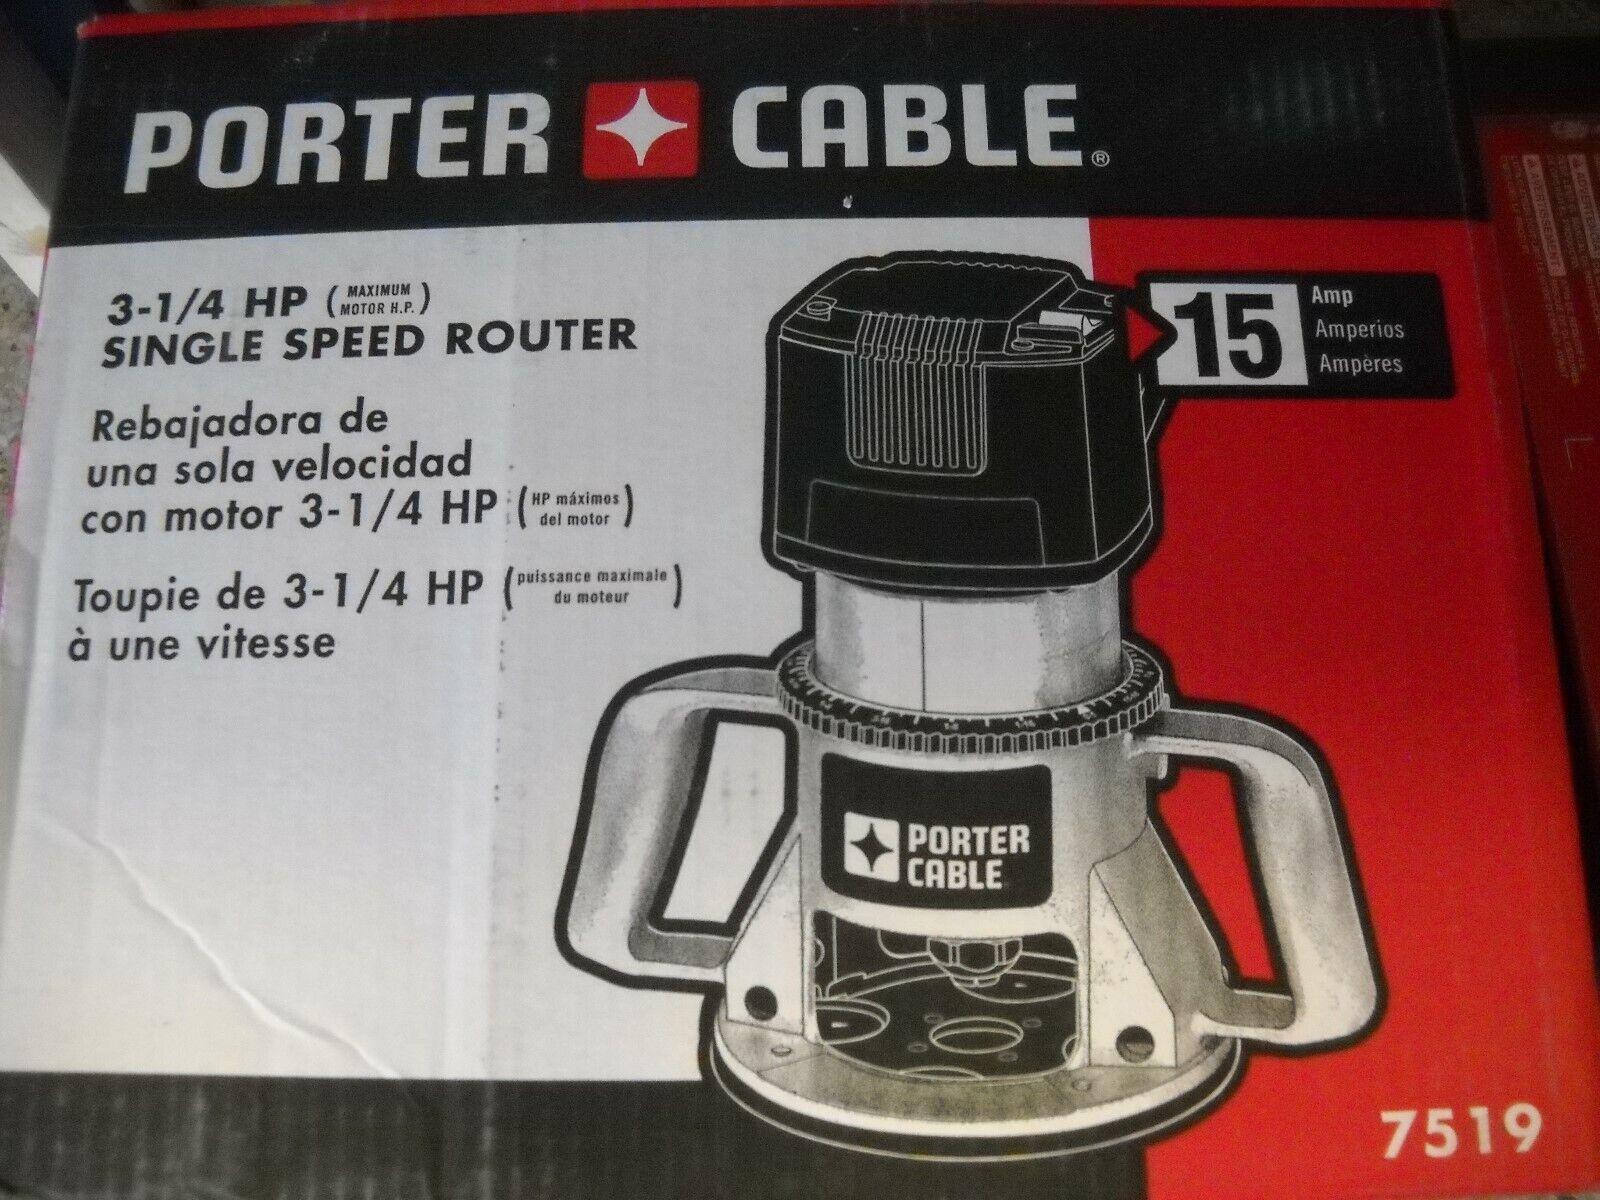 Porter Cable 7519 3-1/4 Peak HP Router 21,000 RPM 15 AMP Spe